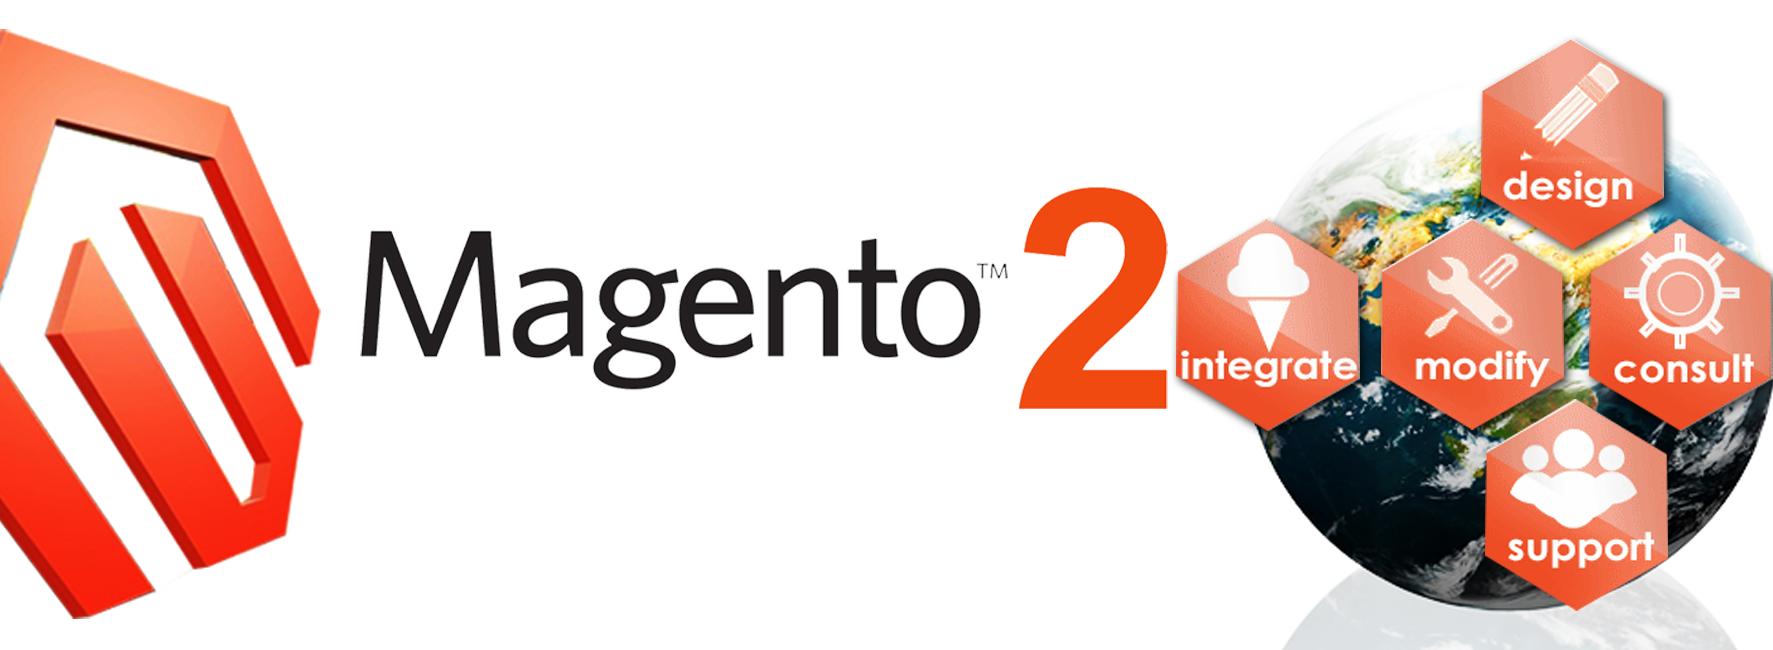 magento-services-en.html